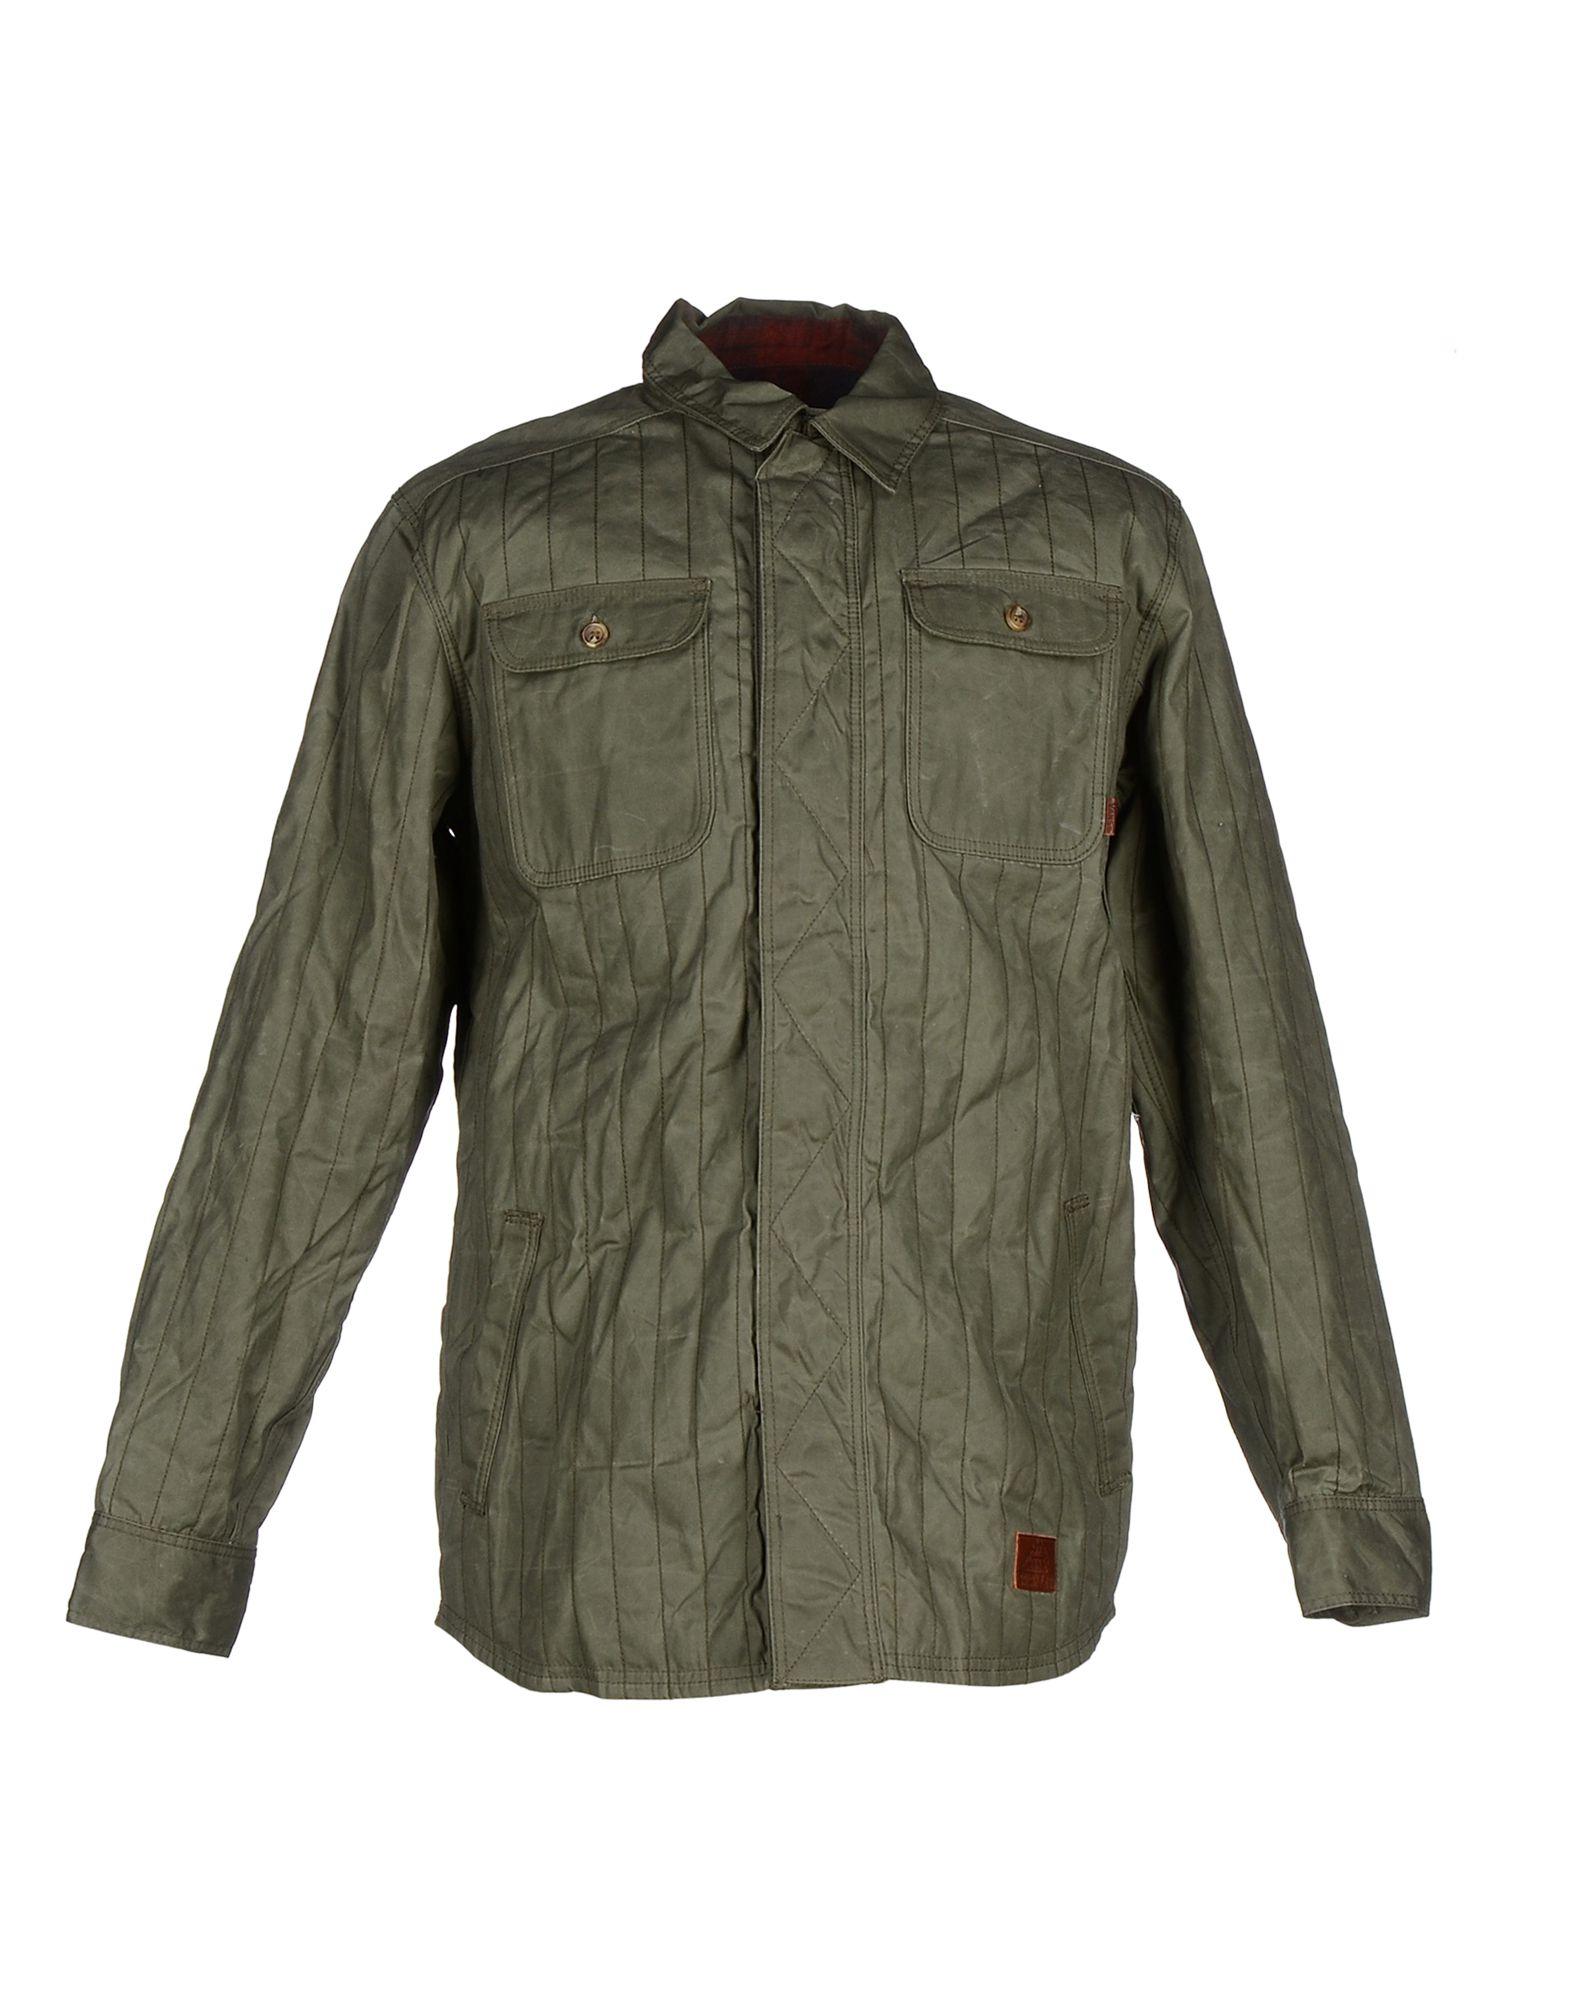 Vans Jacket In Green For Men (Military Green) | Lyst